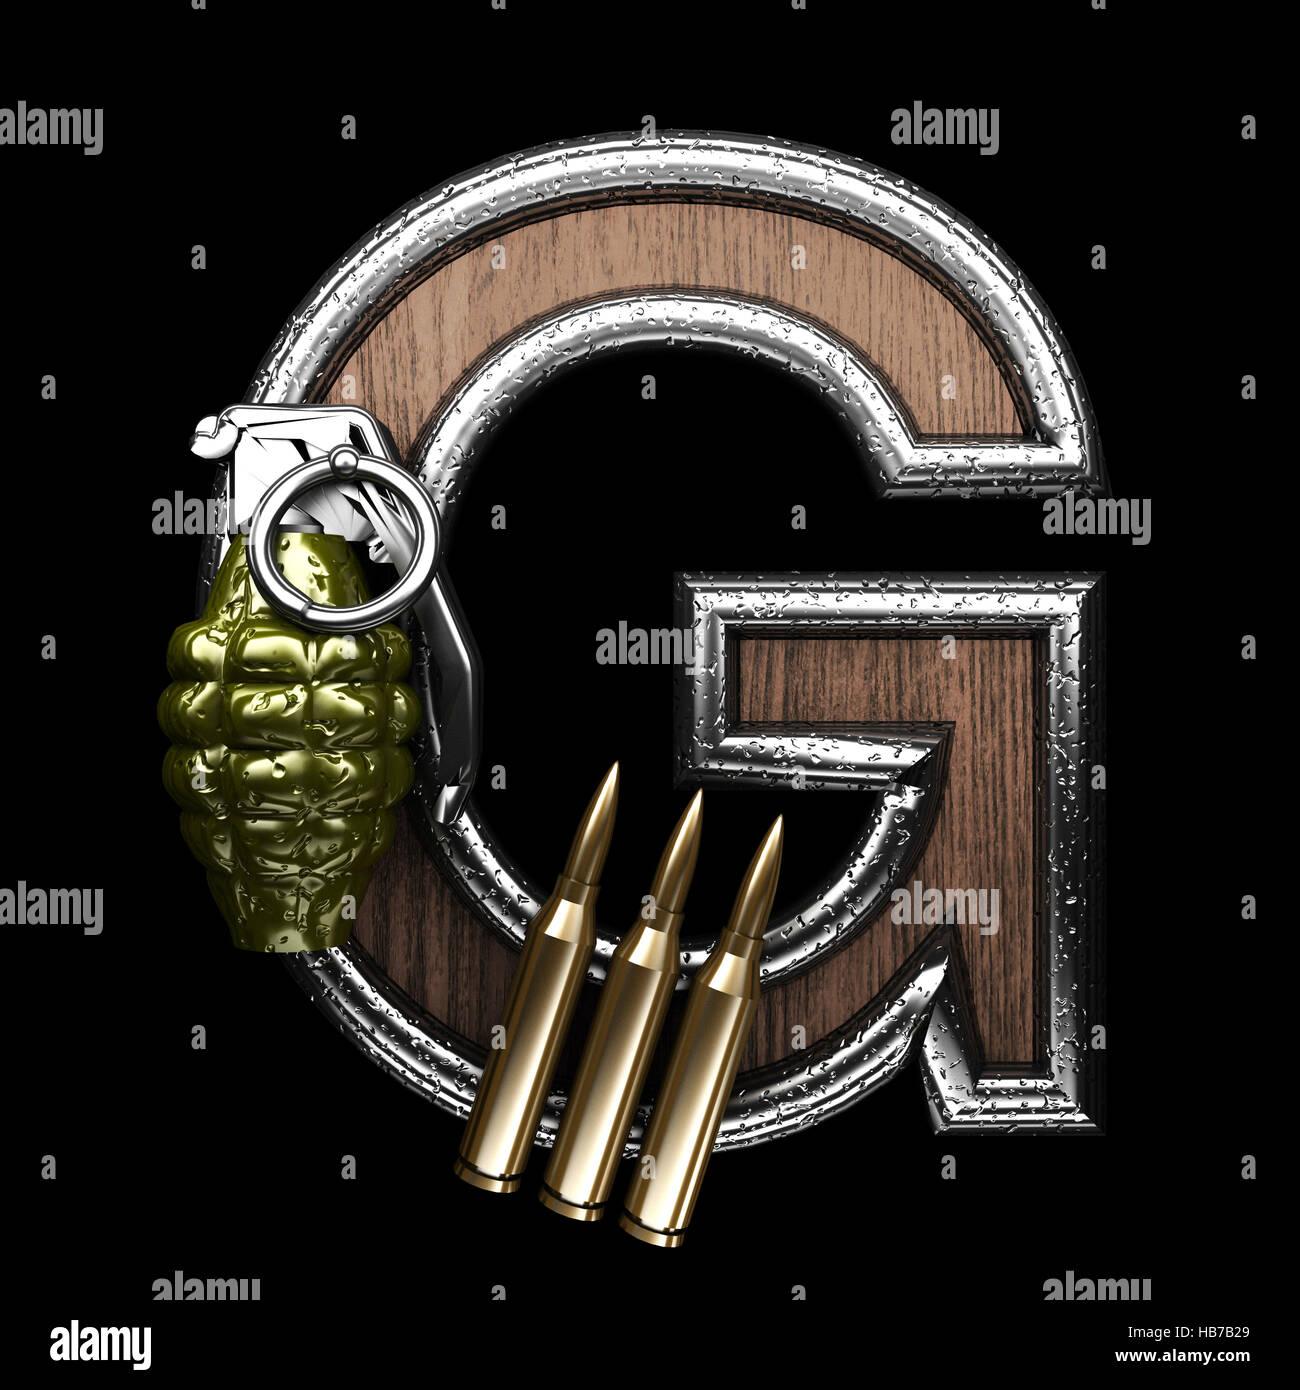 g military letter. 3D illustration Stock Photo: 127396145 - Alamy